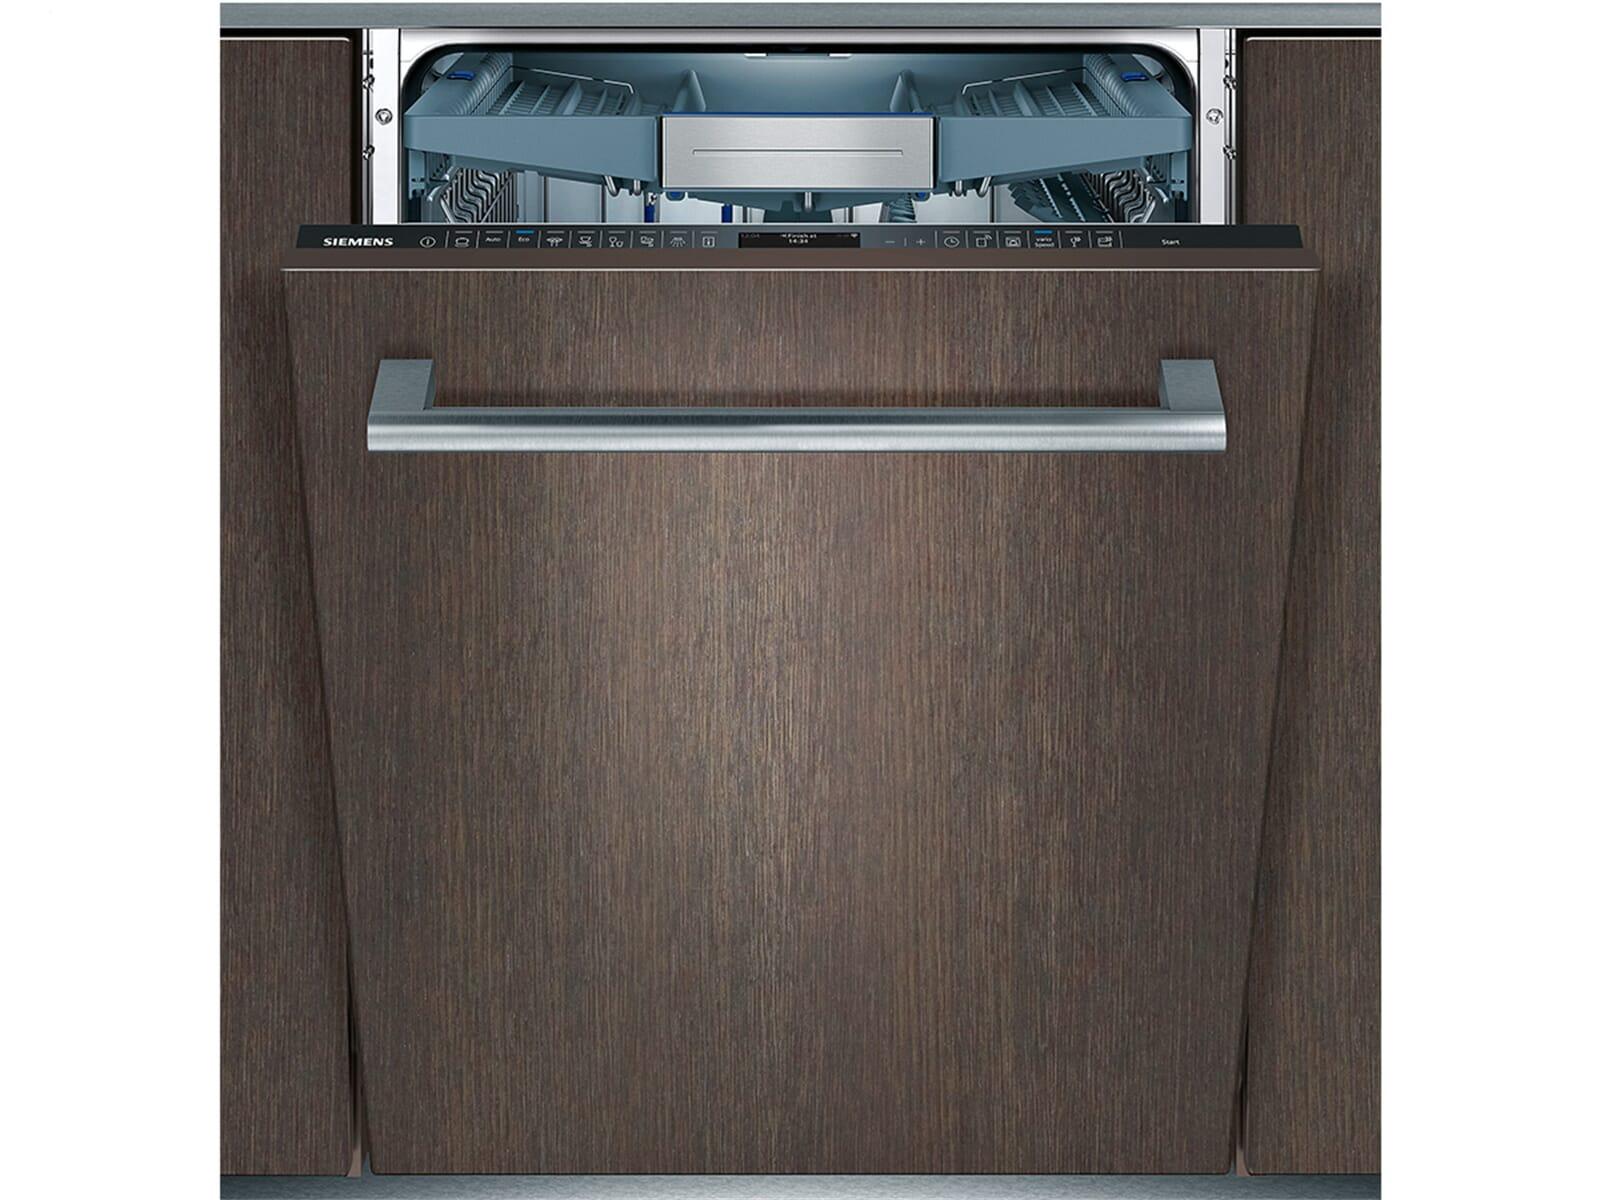 Siemens Kühlschrank Vollintegrierbar : Siemens sx te vollintegrierbarer einbaugeschirrspüler xxl